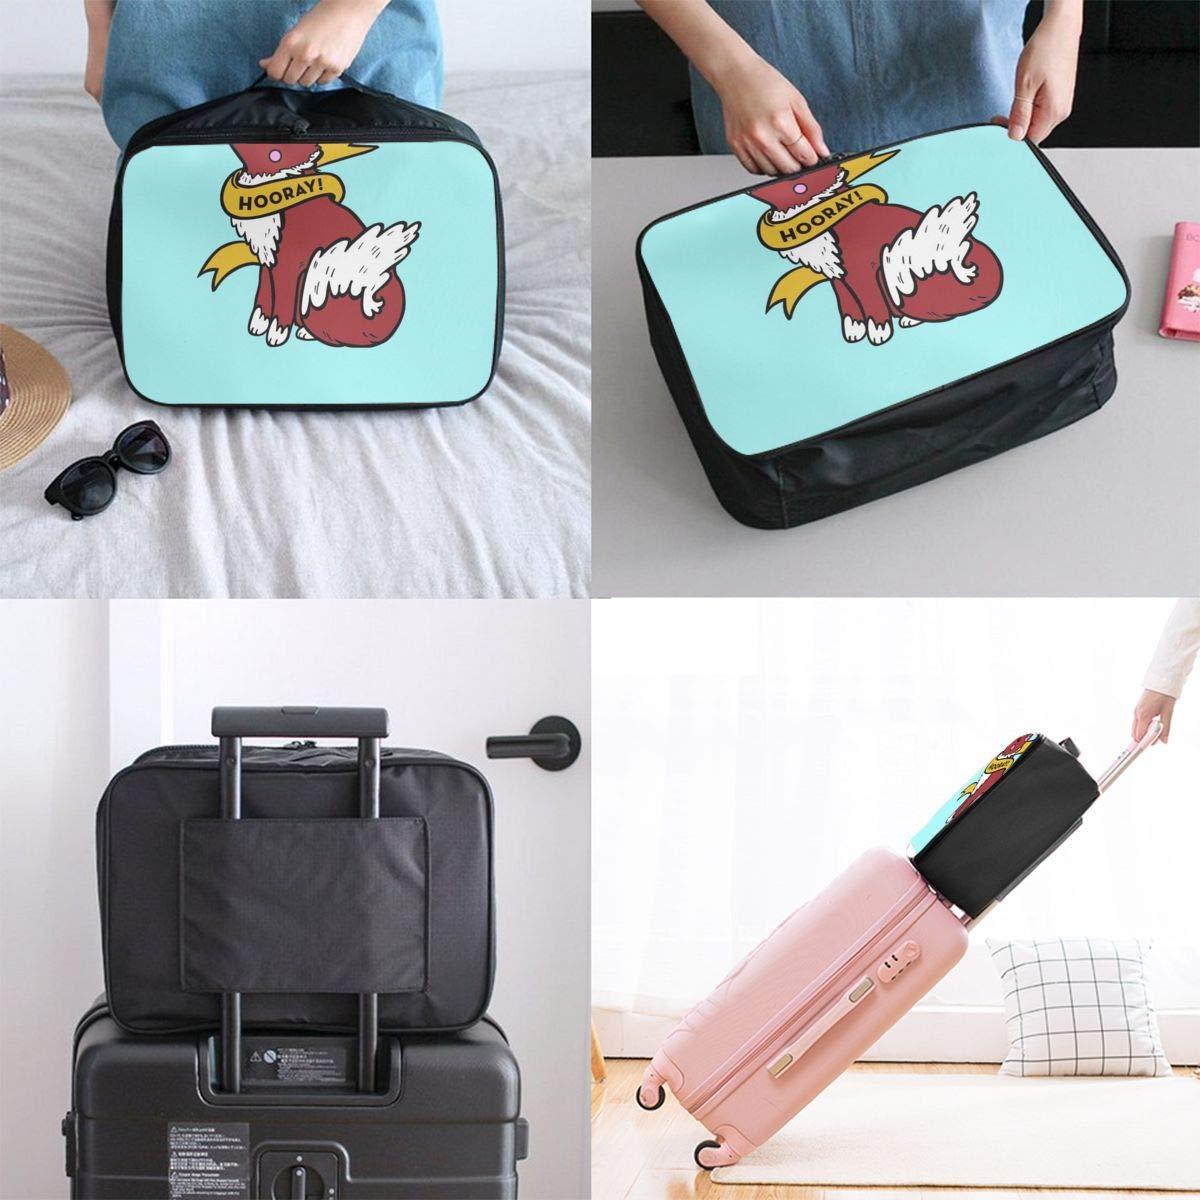 Wolf Dog Enamel Pin Mercat Customize Casual Portable Travel Bag Suitcase Storage Bag Luggage Packing Tote Bag Trolley Bag